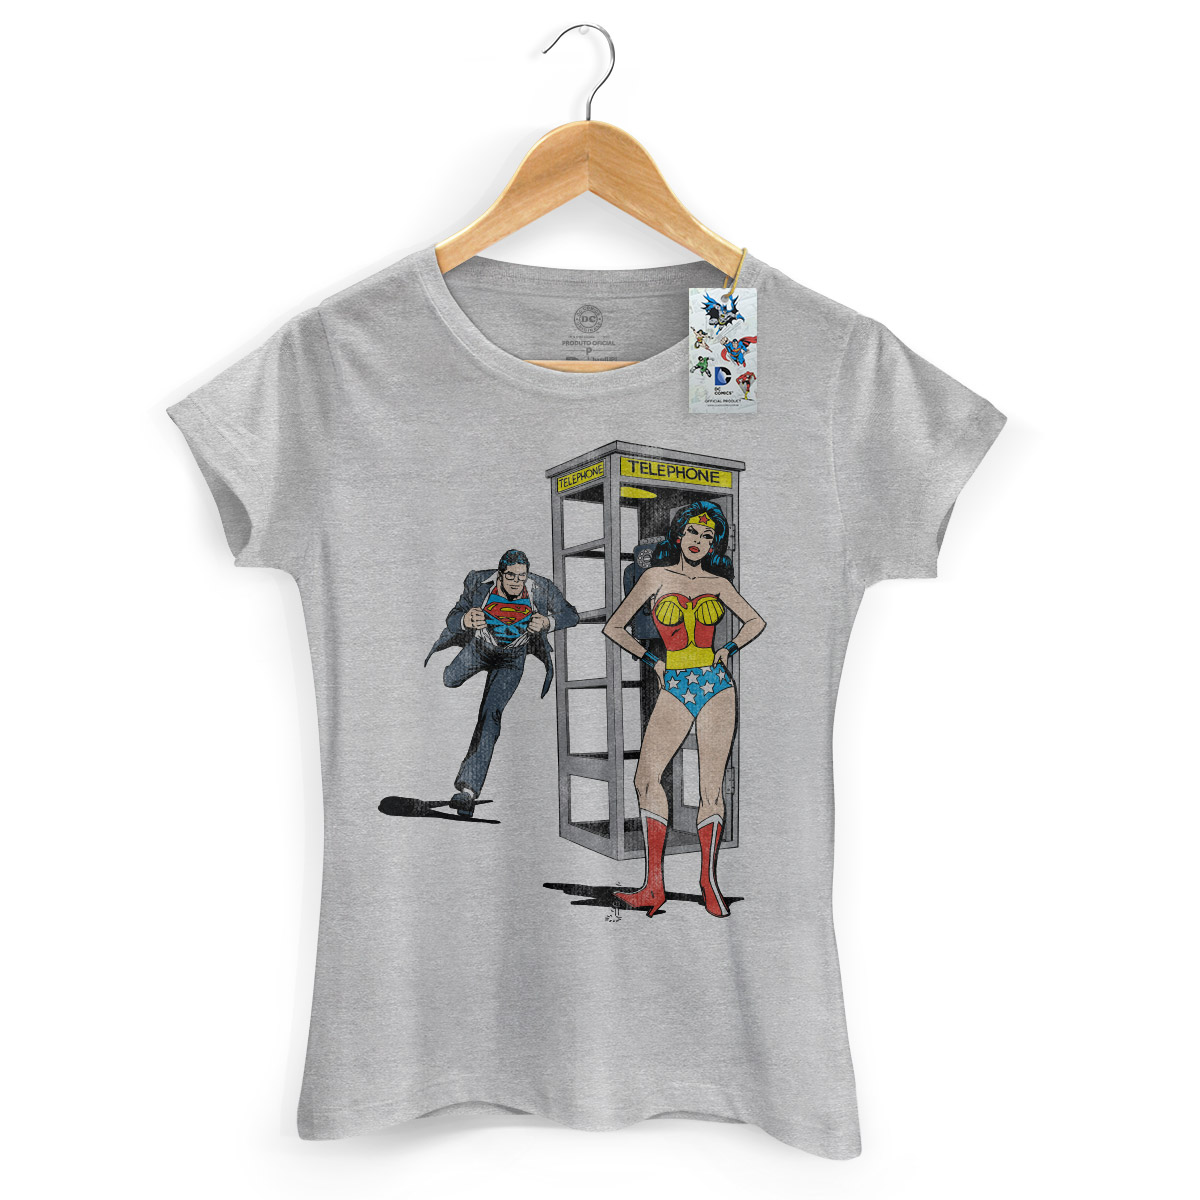 Camiseta Feminina Wonder Woman Telephone